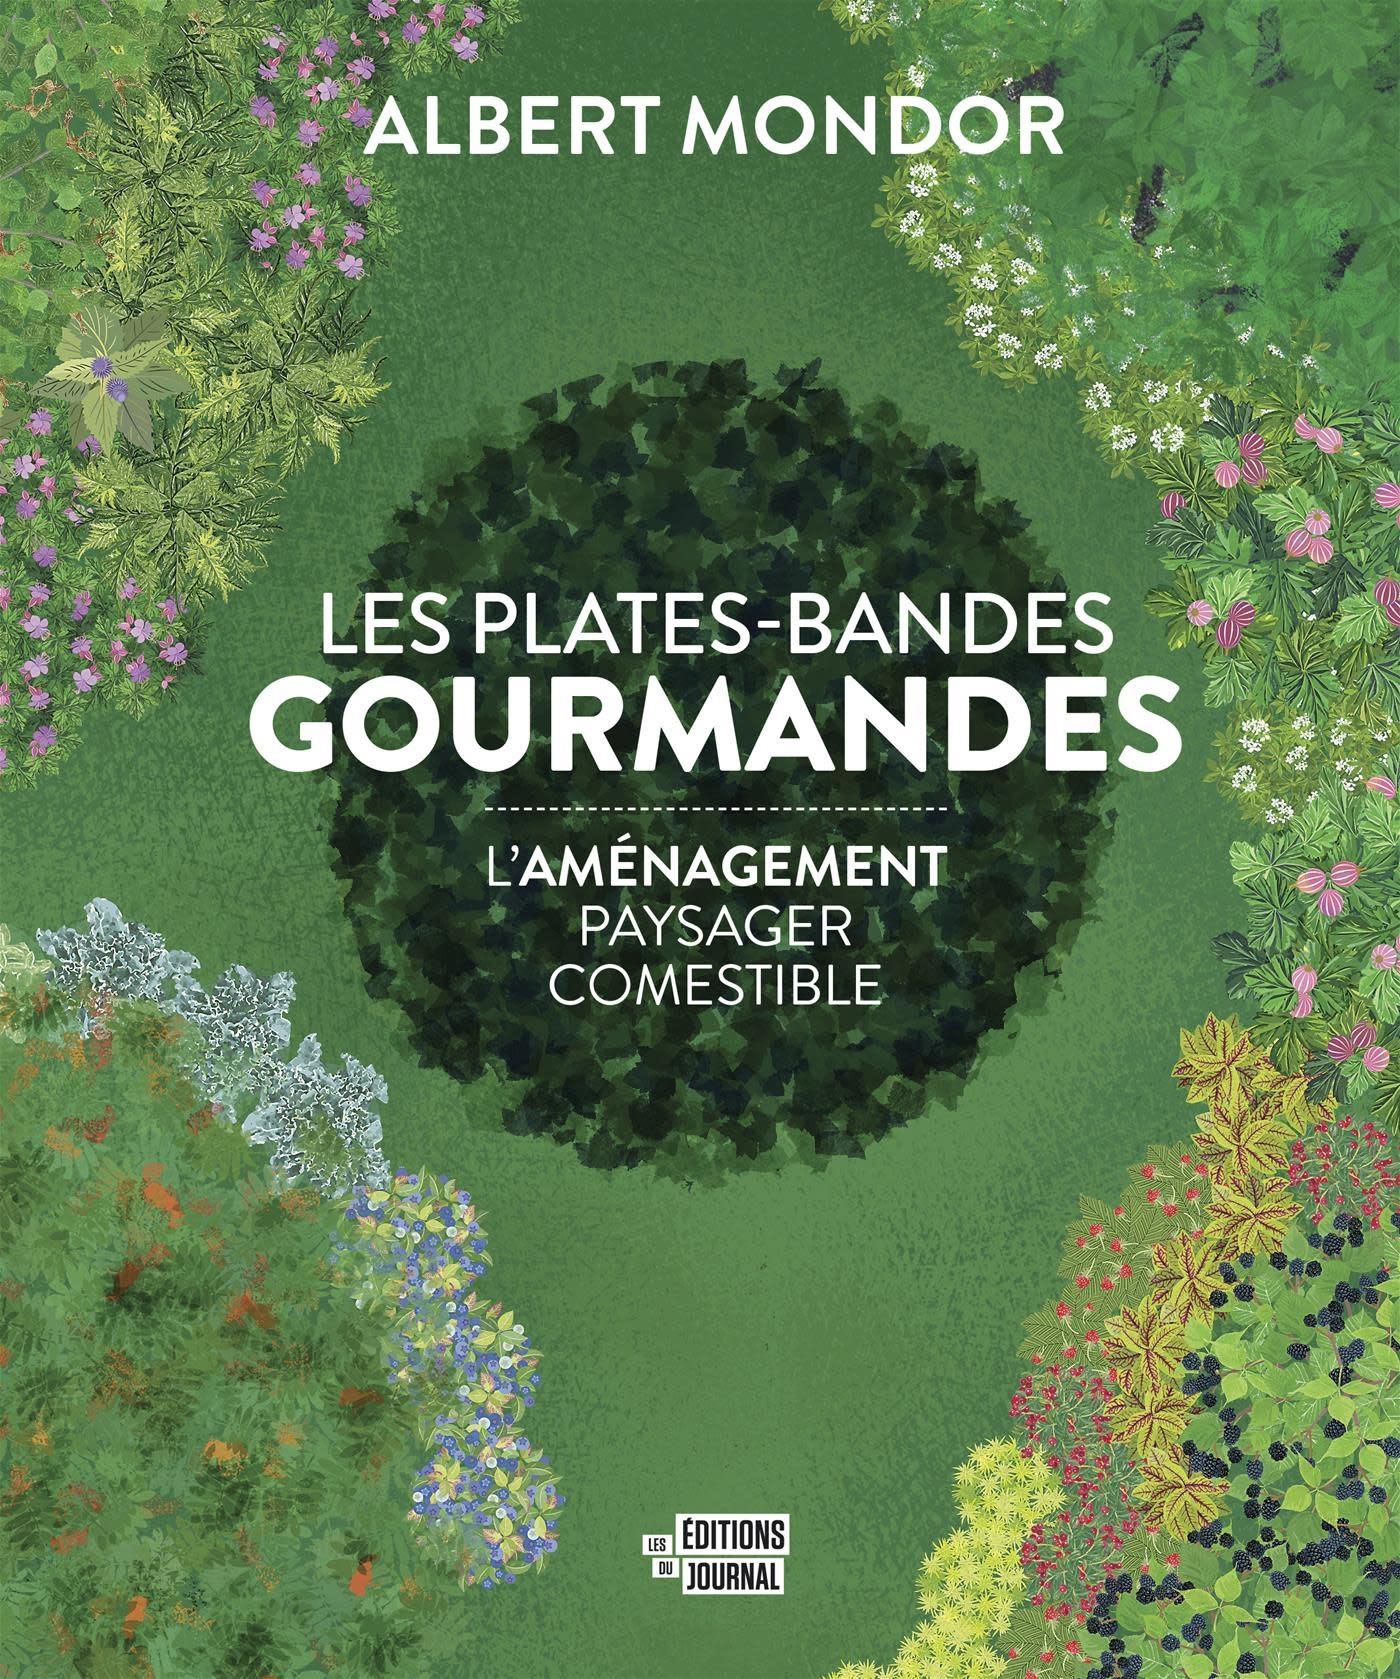 Les plates-bandes gourmandes - Albert Mondor - 2019